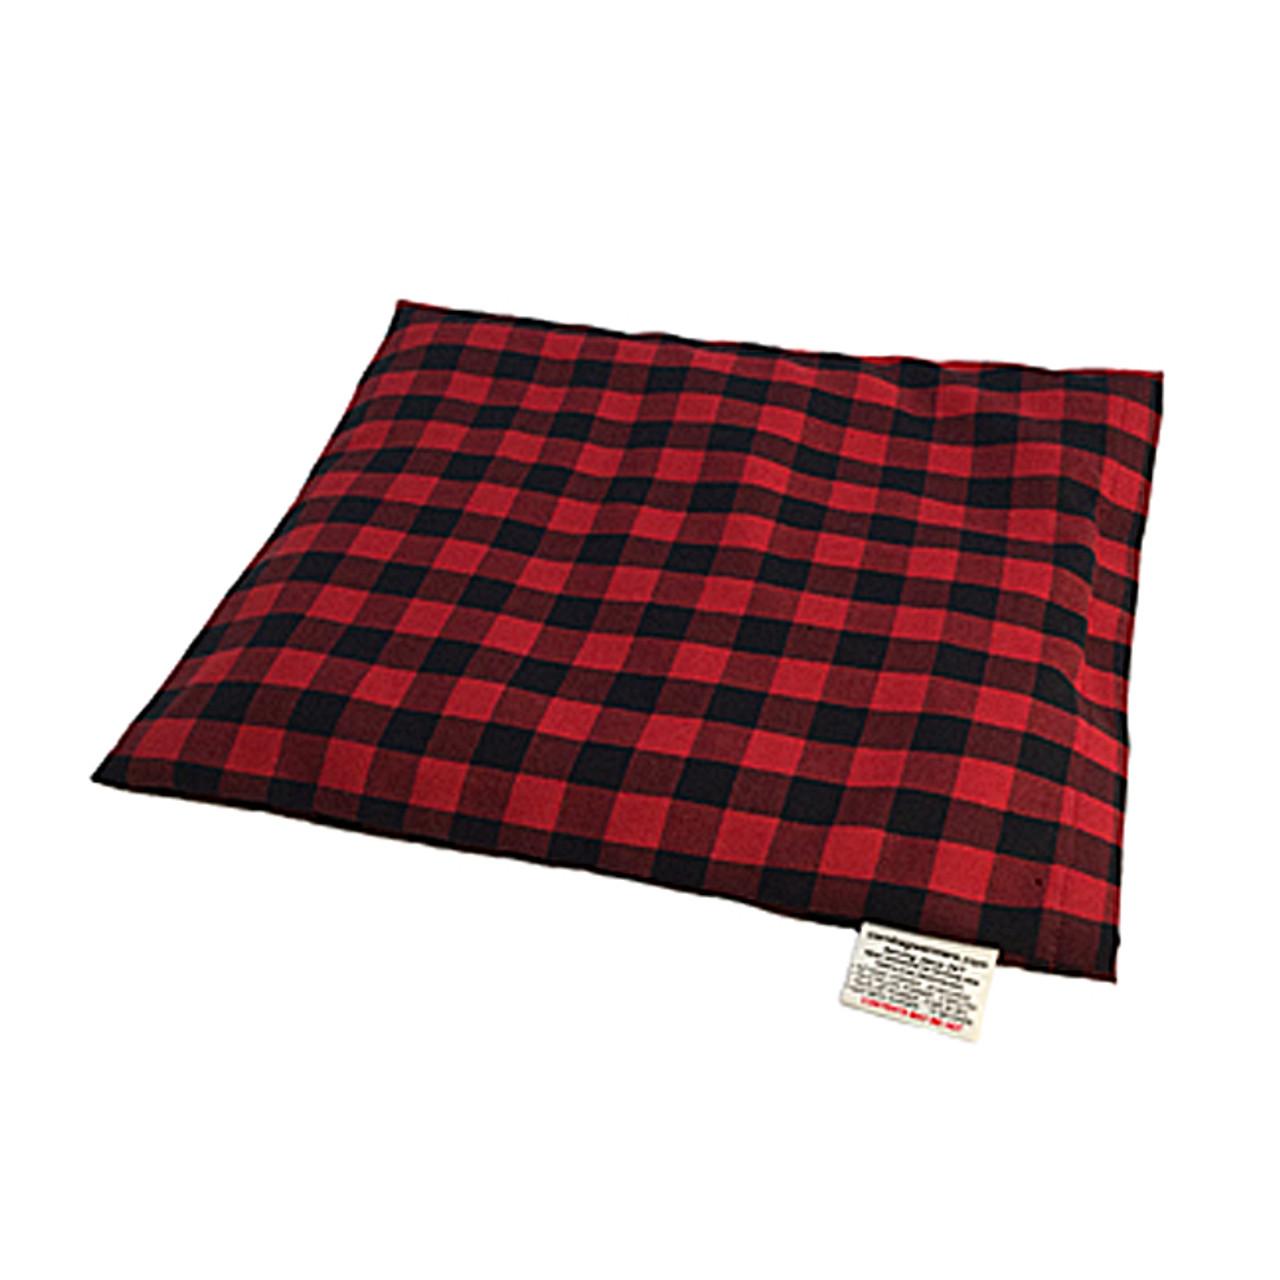 Deep Red & Black Plaid Pillow Warmer Microwave Heating Pad